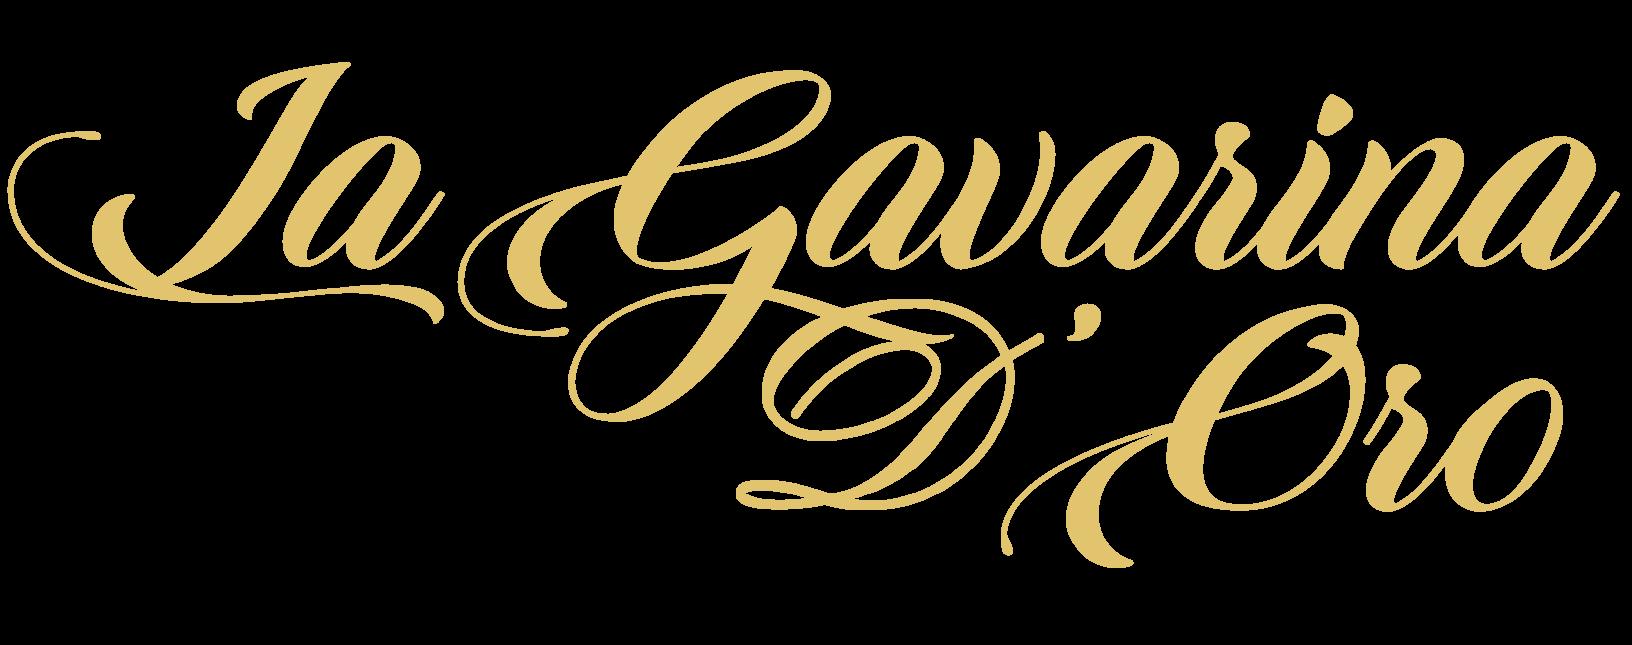 La Gavarina d'Oro